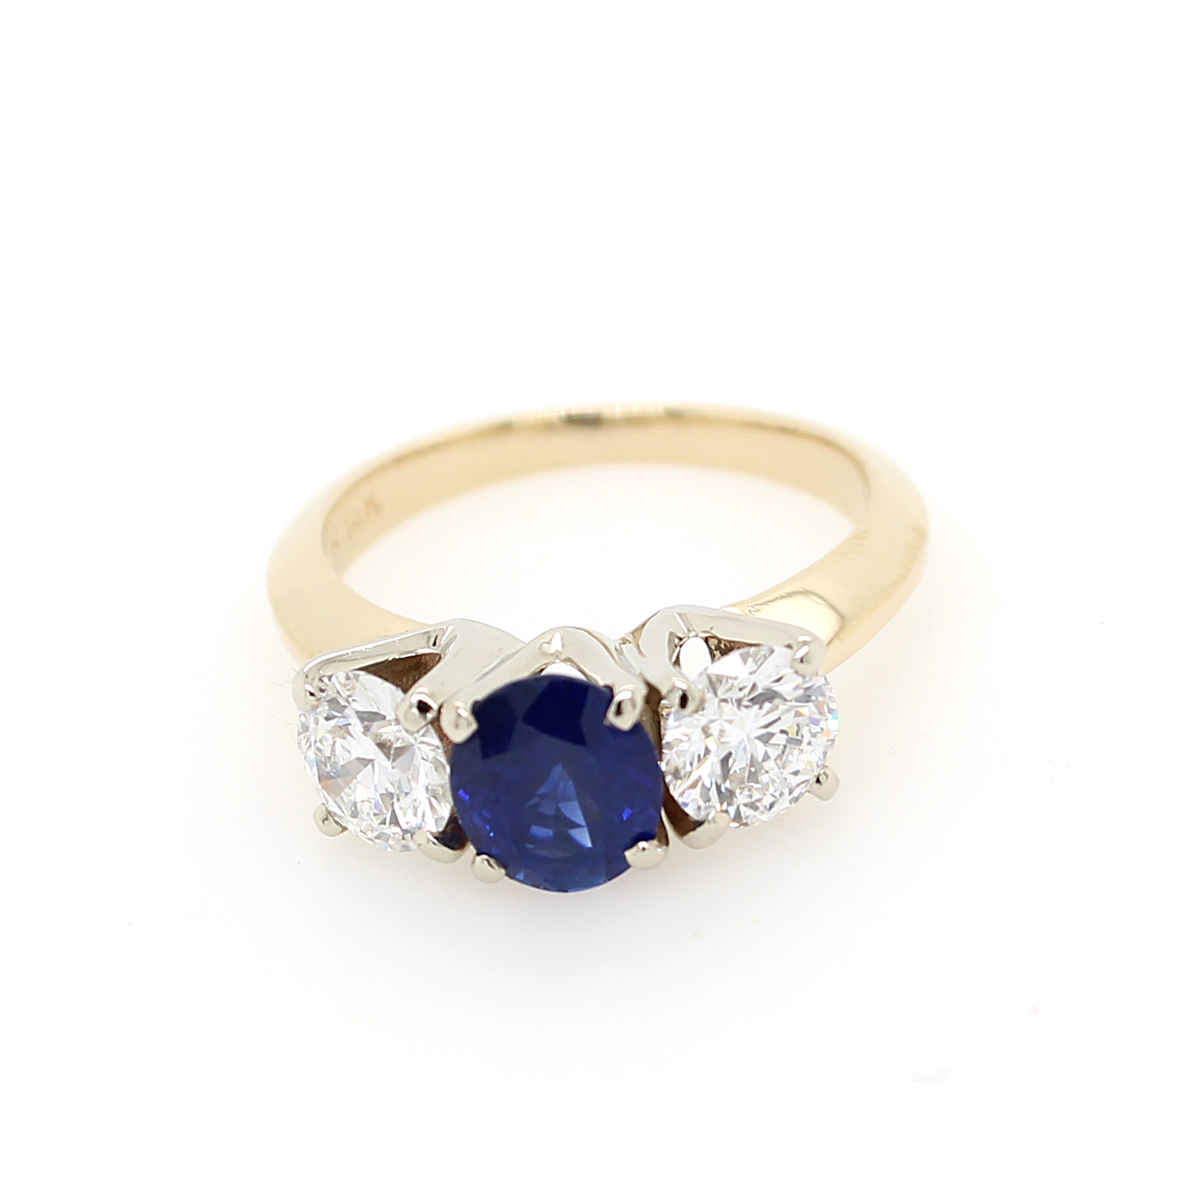 Vintage 14 Karat Yellow Gold Sapphire and Diamond Ring